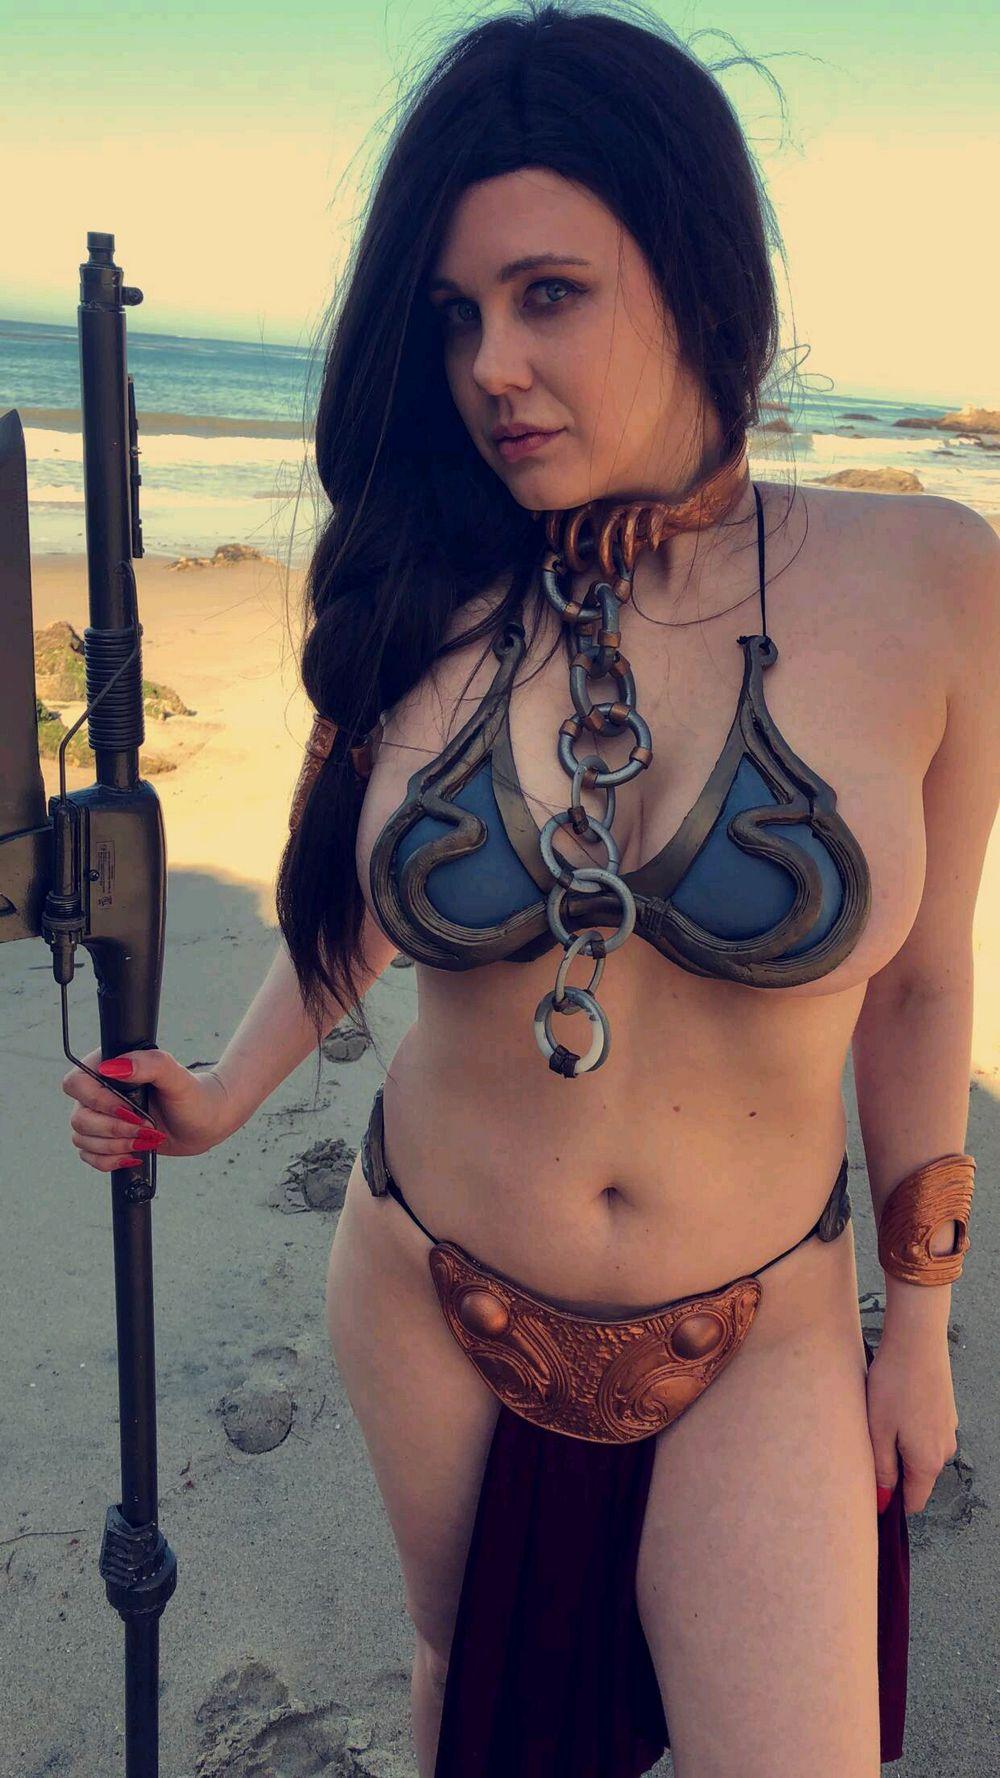 50+ Maitland Ward Nude, Naked, Tits, Pussy Pics & Videos